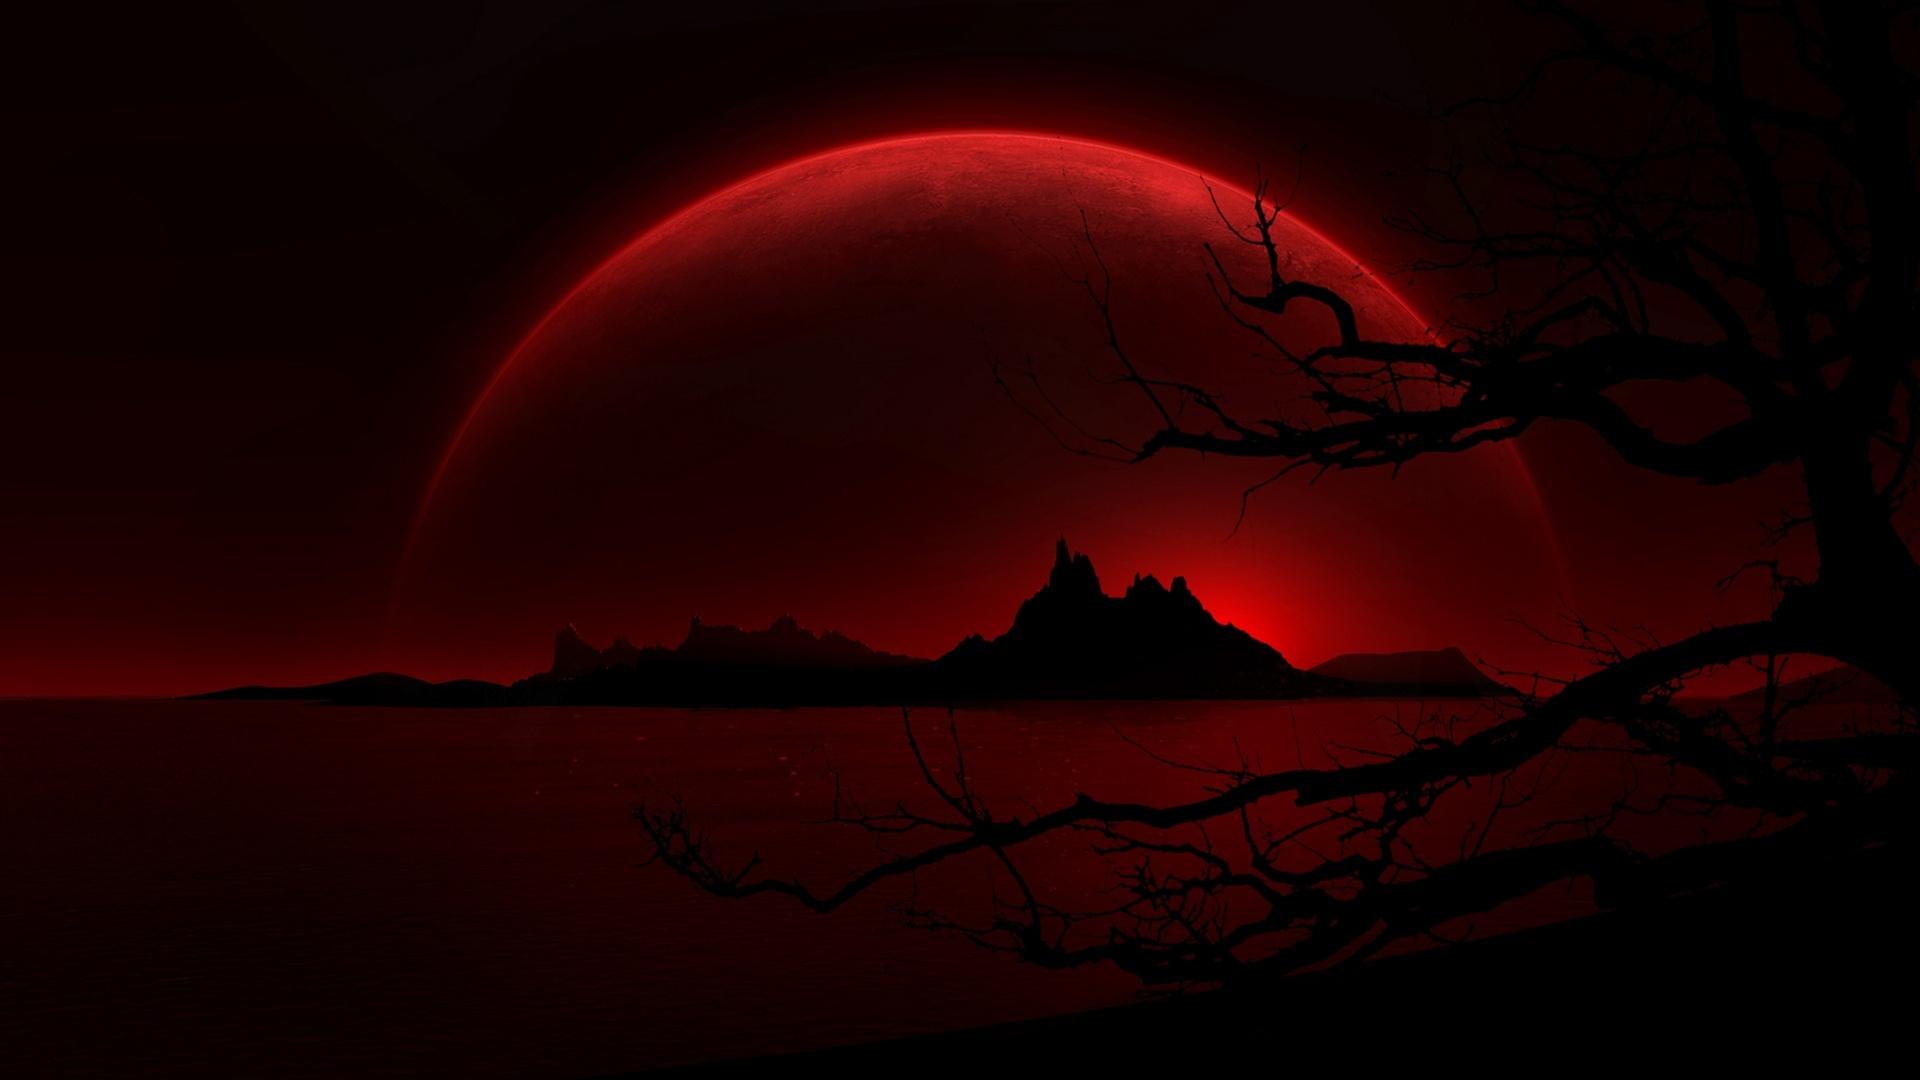 Dark Red Night   1920x1080   234189 1920x1080